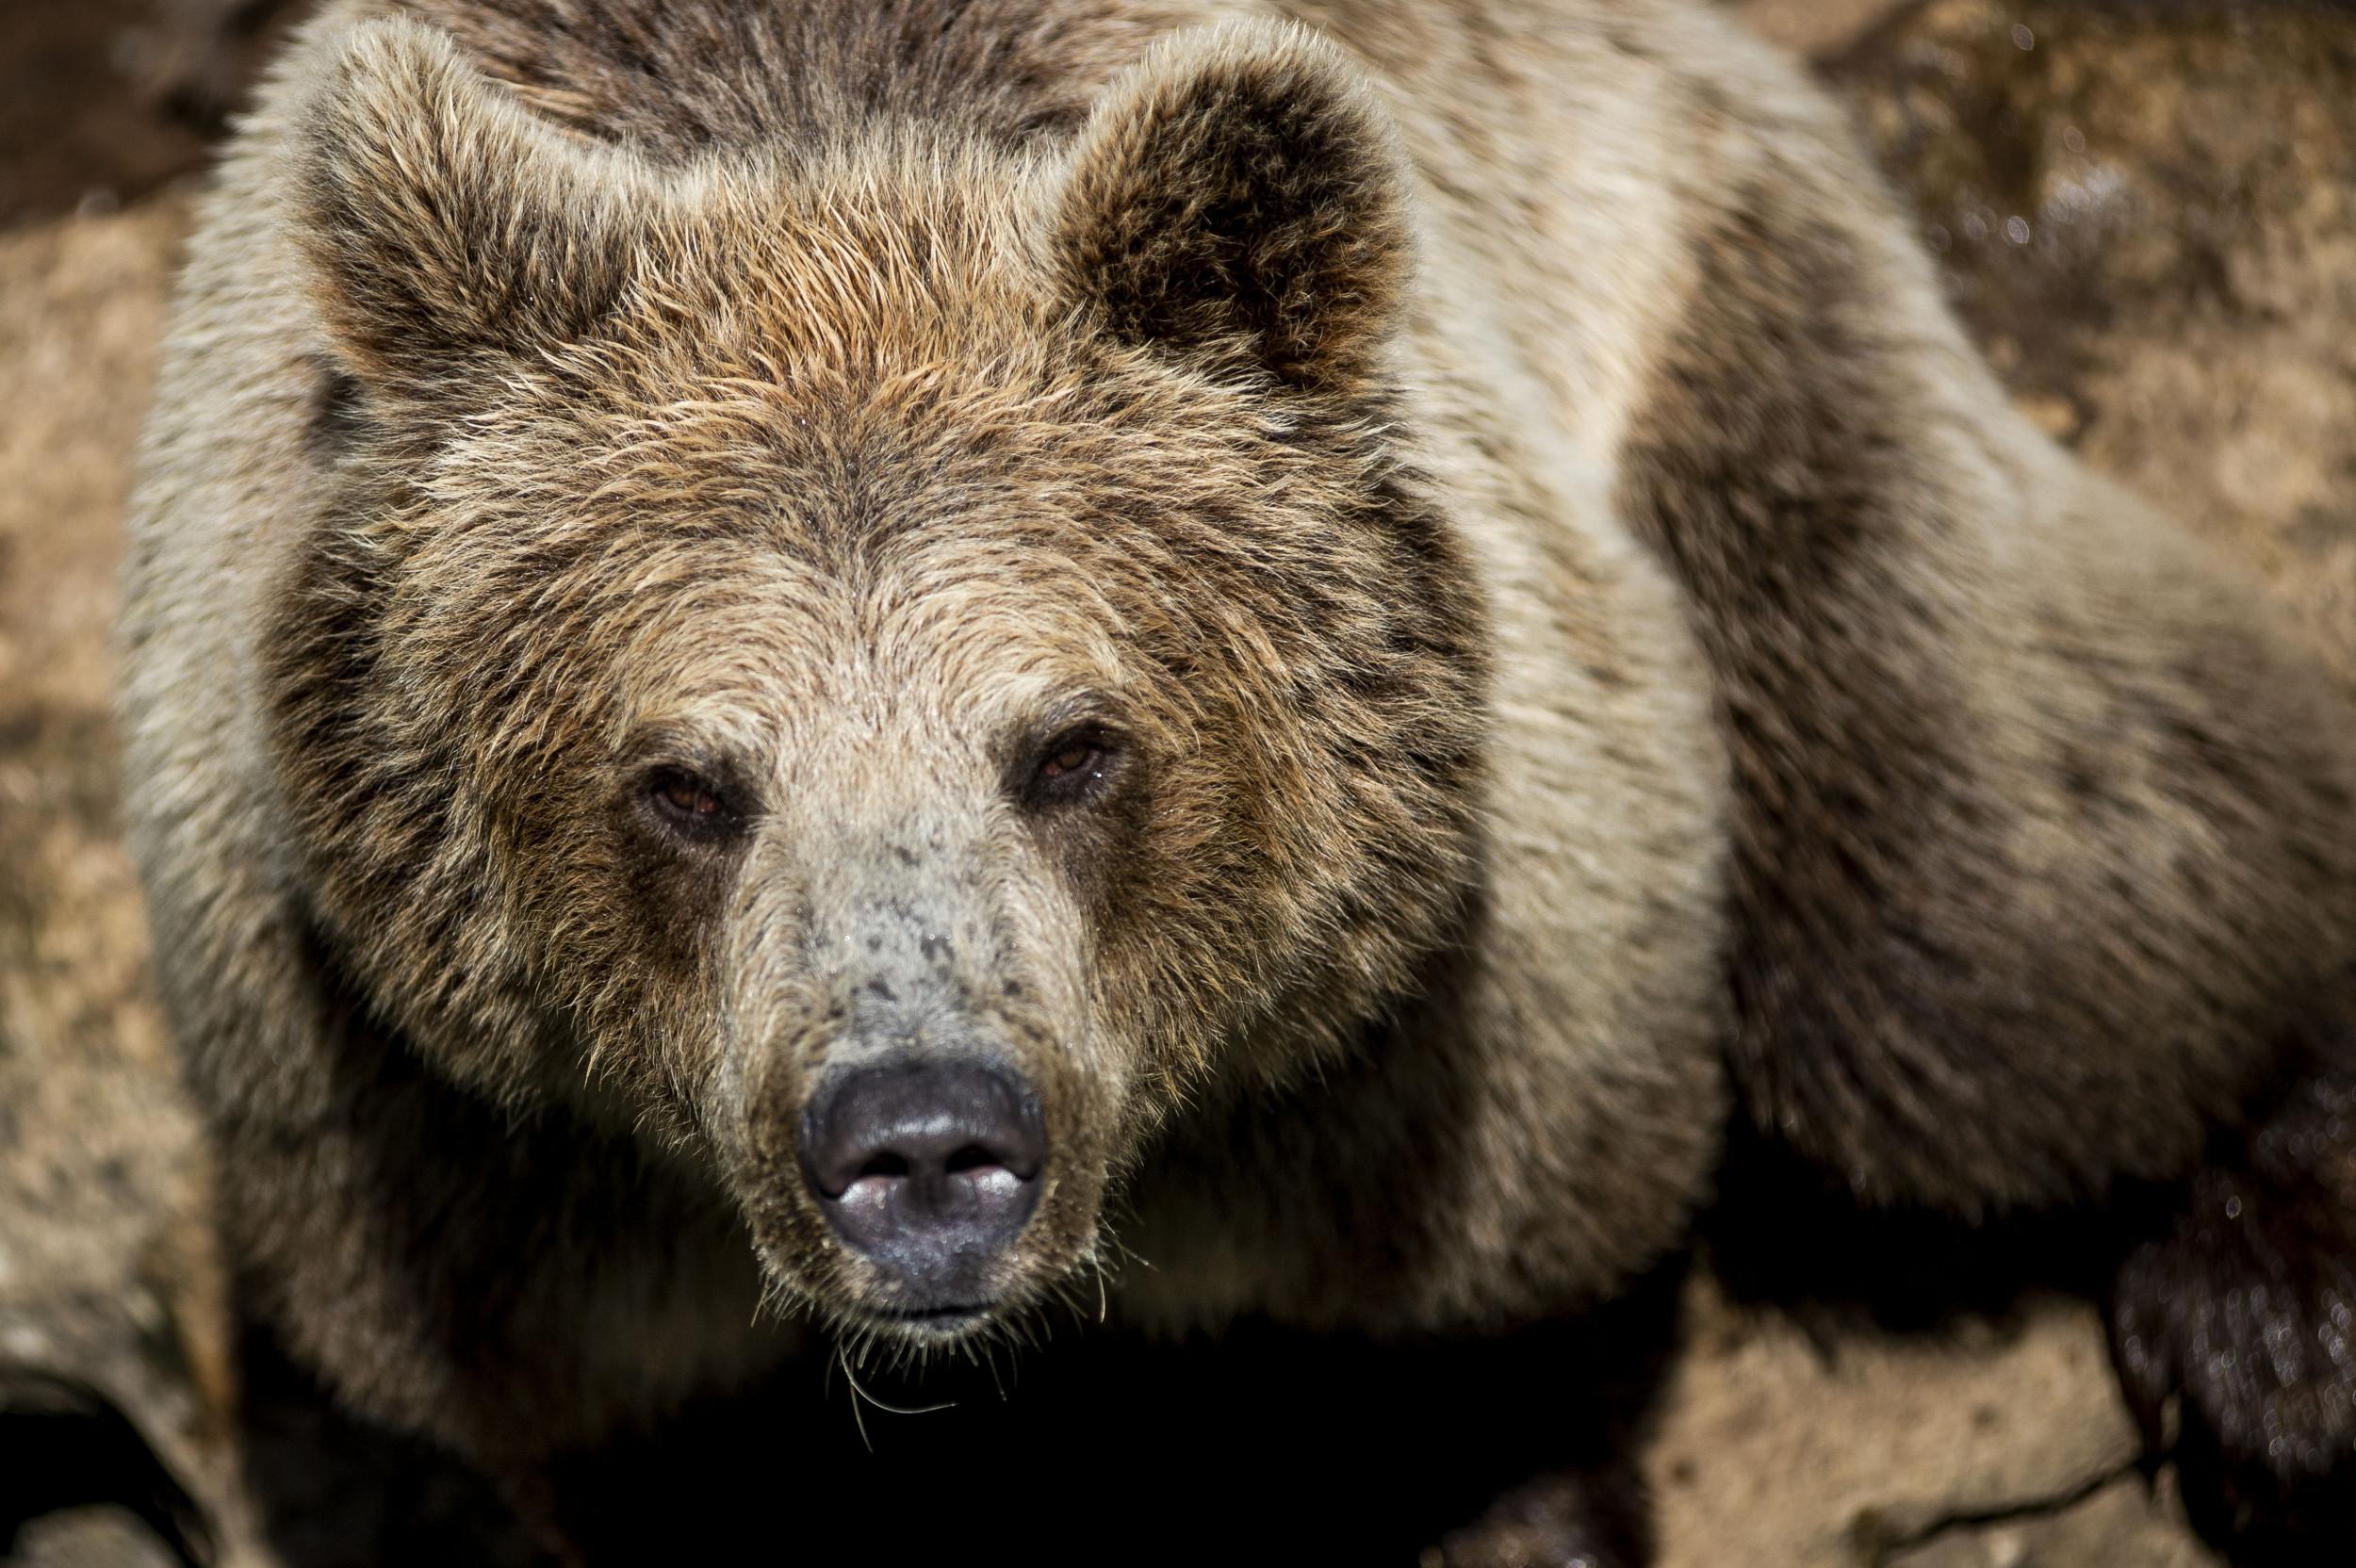 Grizzly Bear forum Ellen downtown Bozeman - March 2, 2019